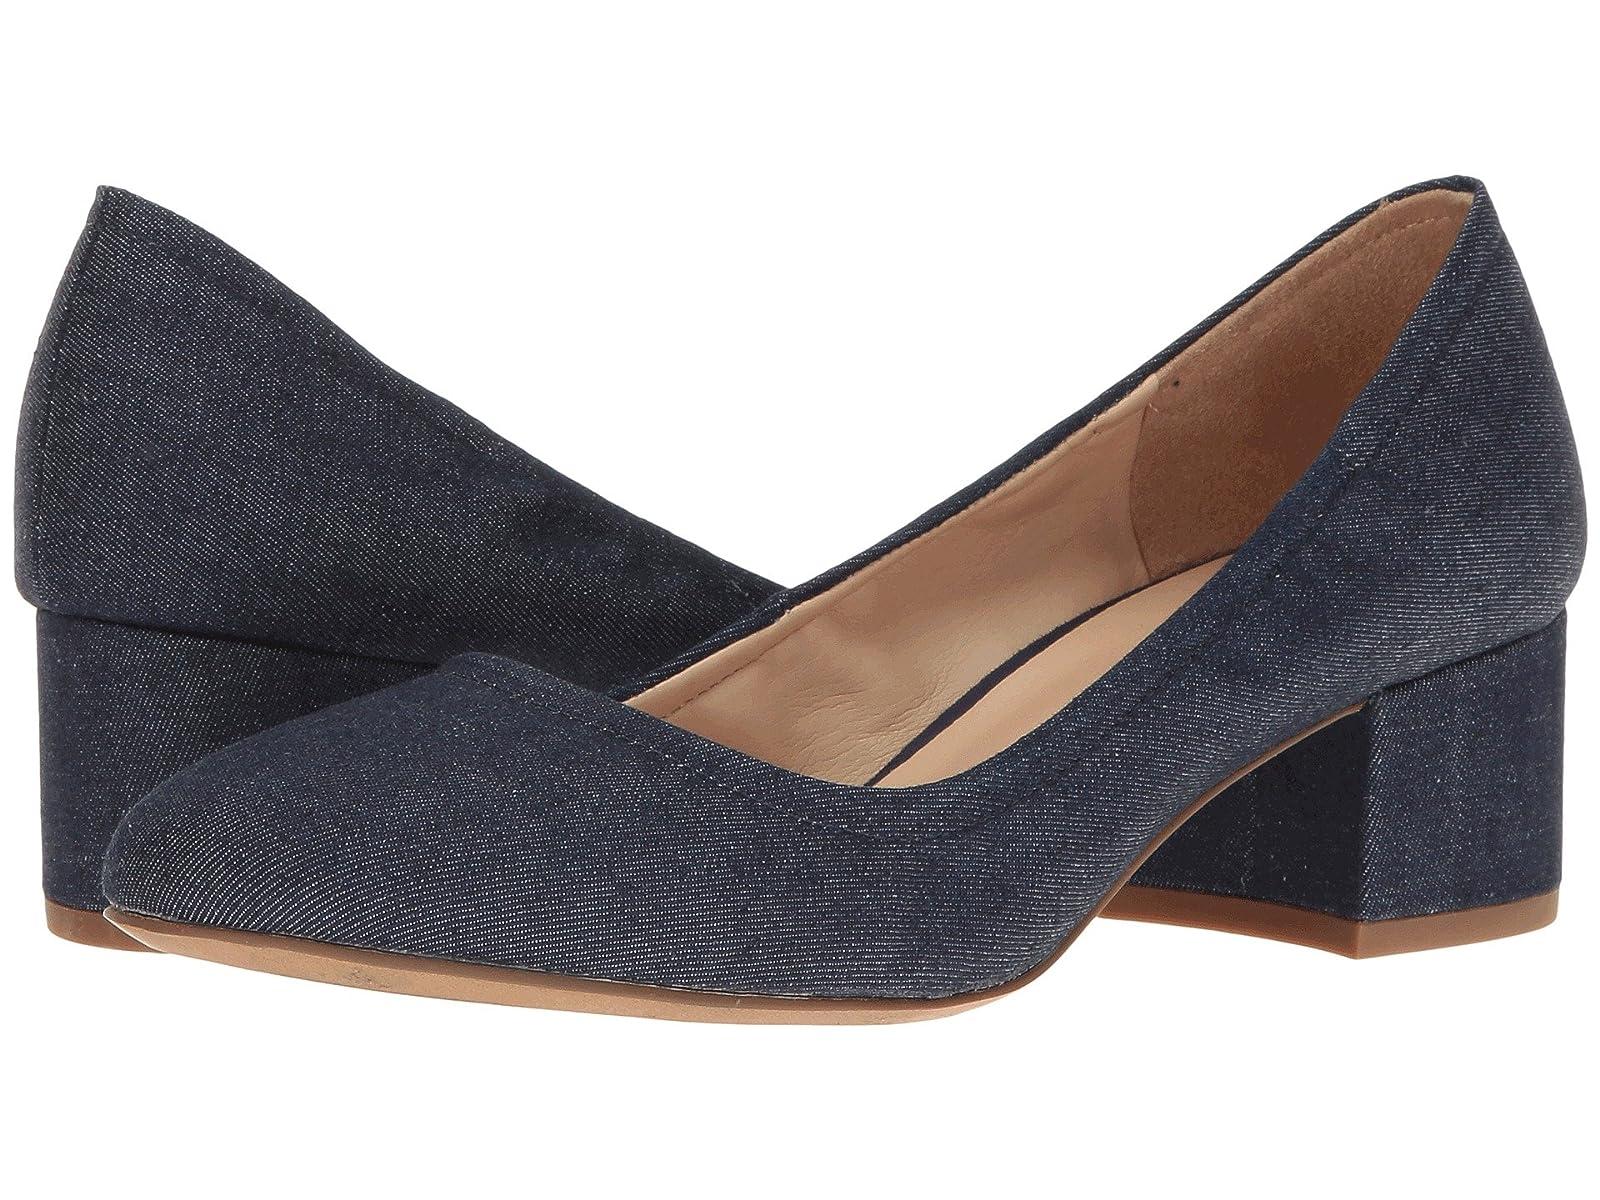 Franco Sarto FaustaCheap and distinctive eye-catching shoes